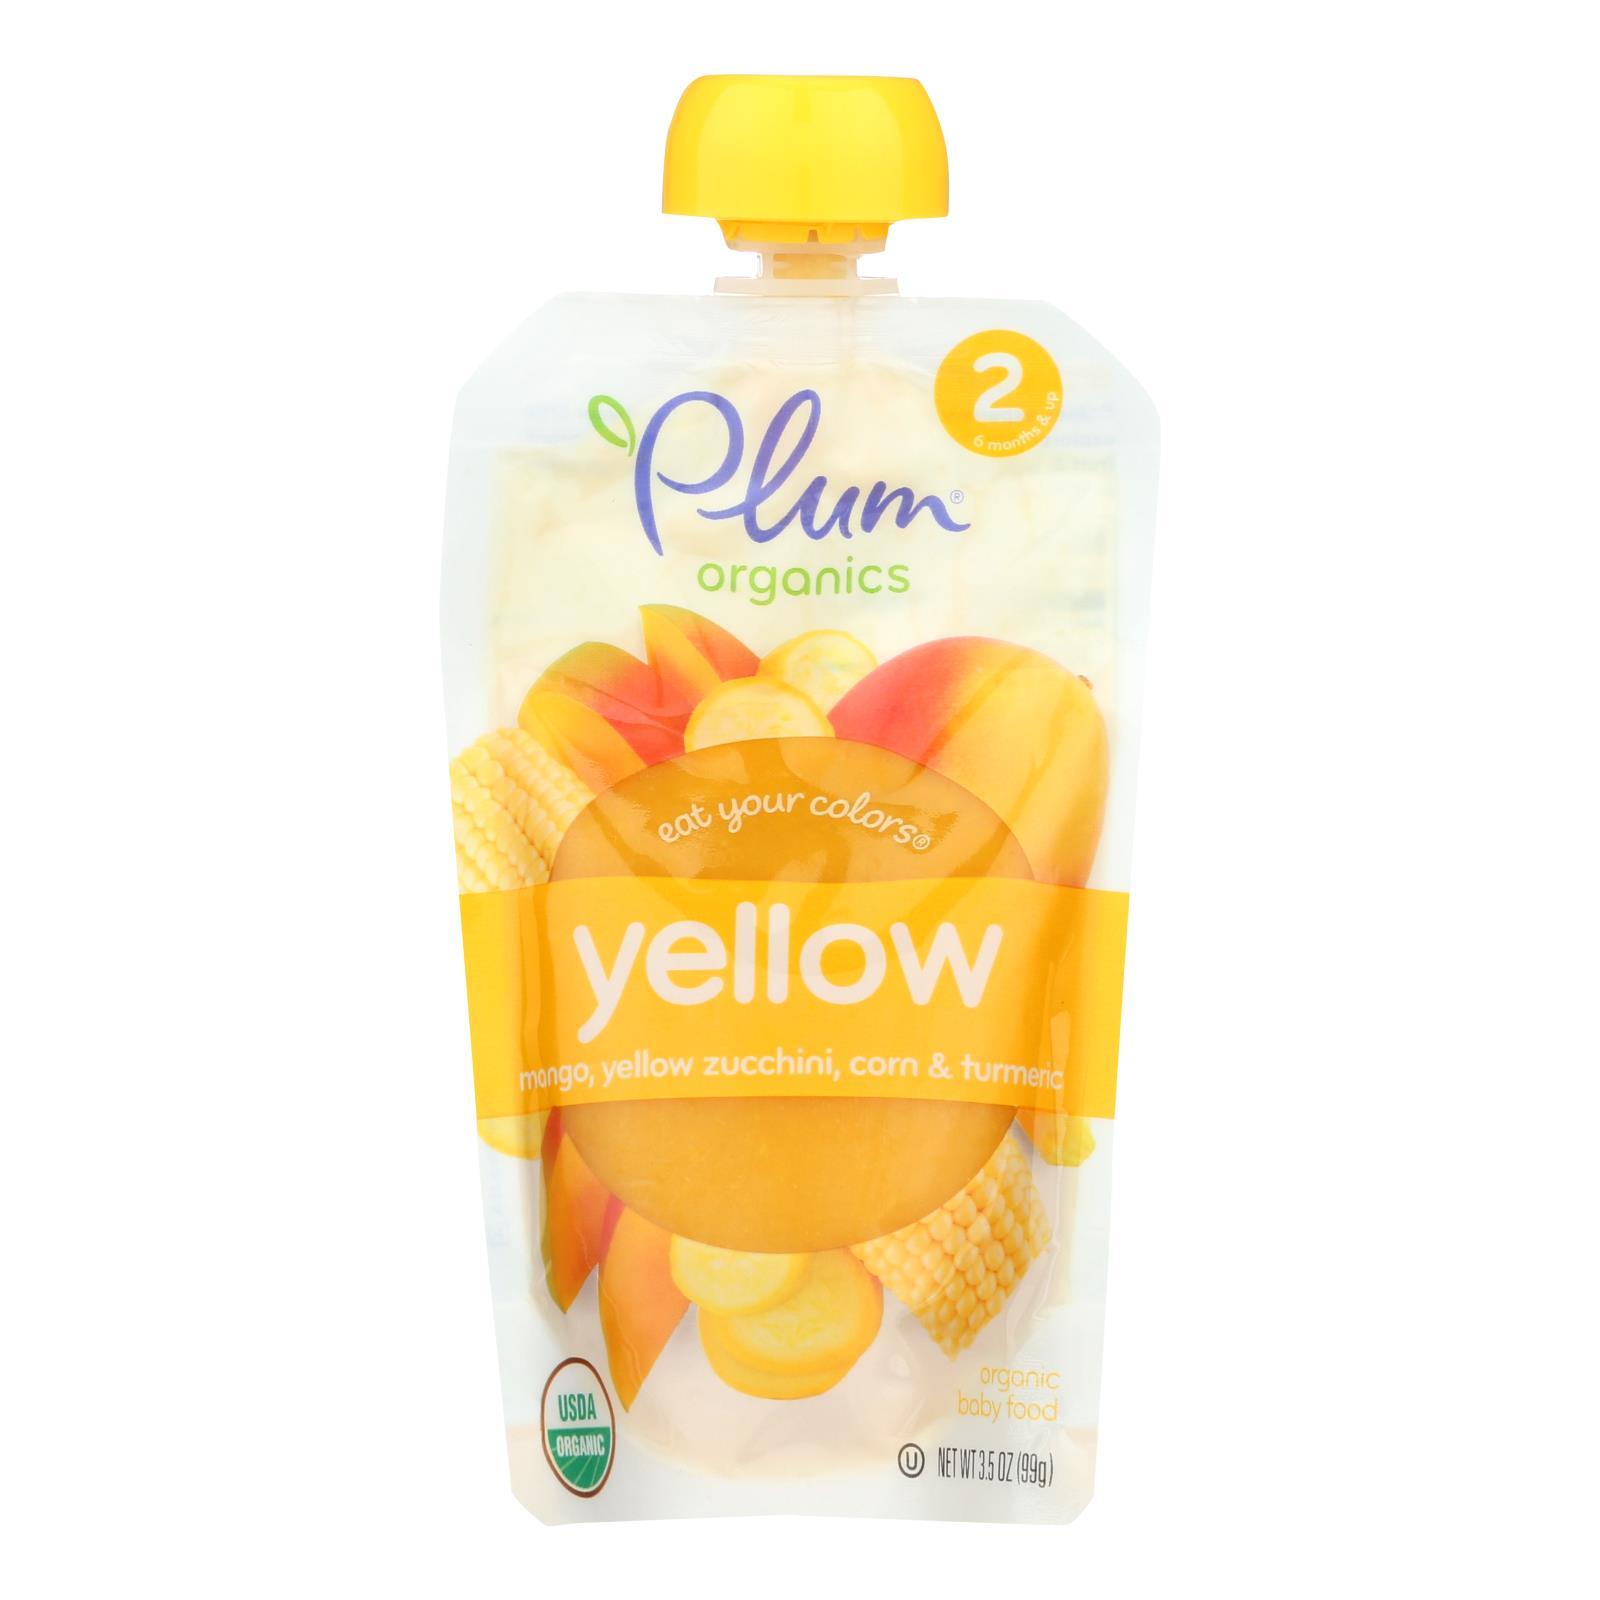 Plum Organics Baby Food  - Case of 6 - 3.5 OZ